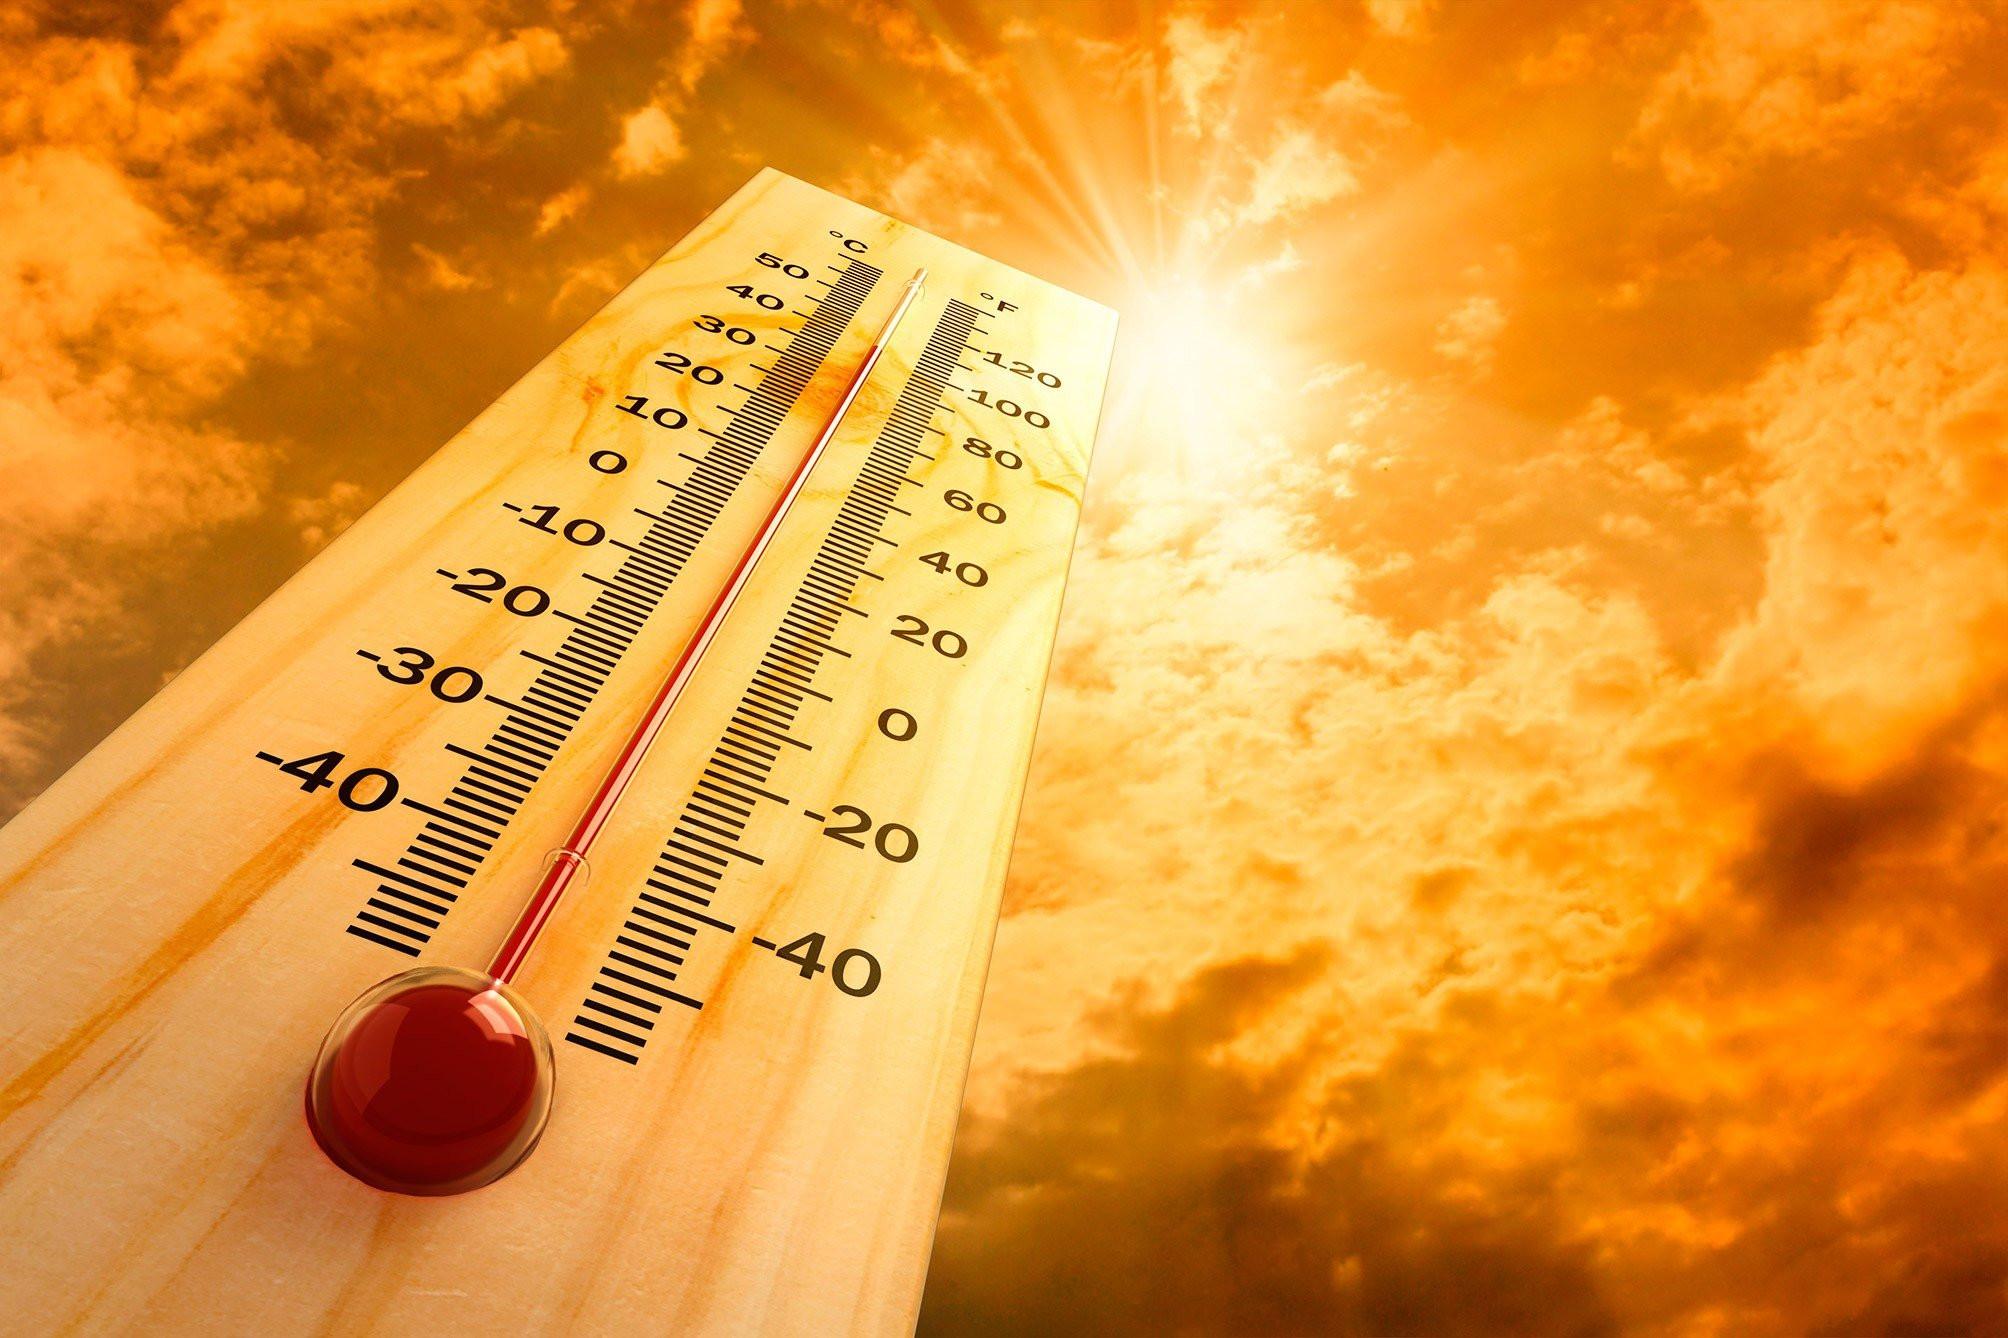 Стало известно, снижает ли жара активность коронавируса